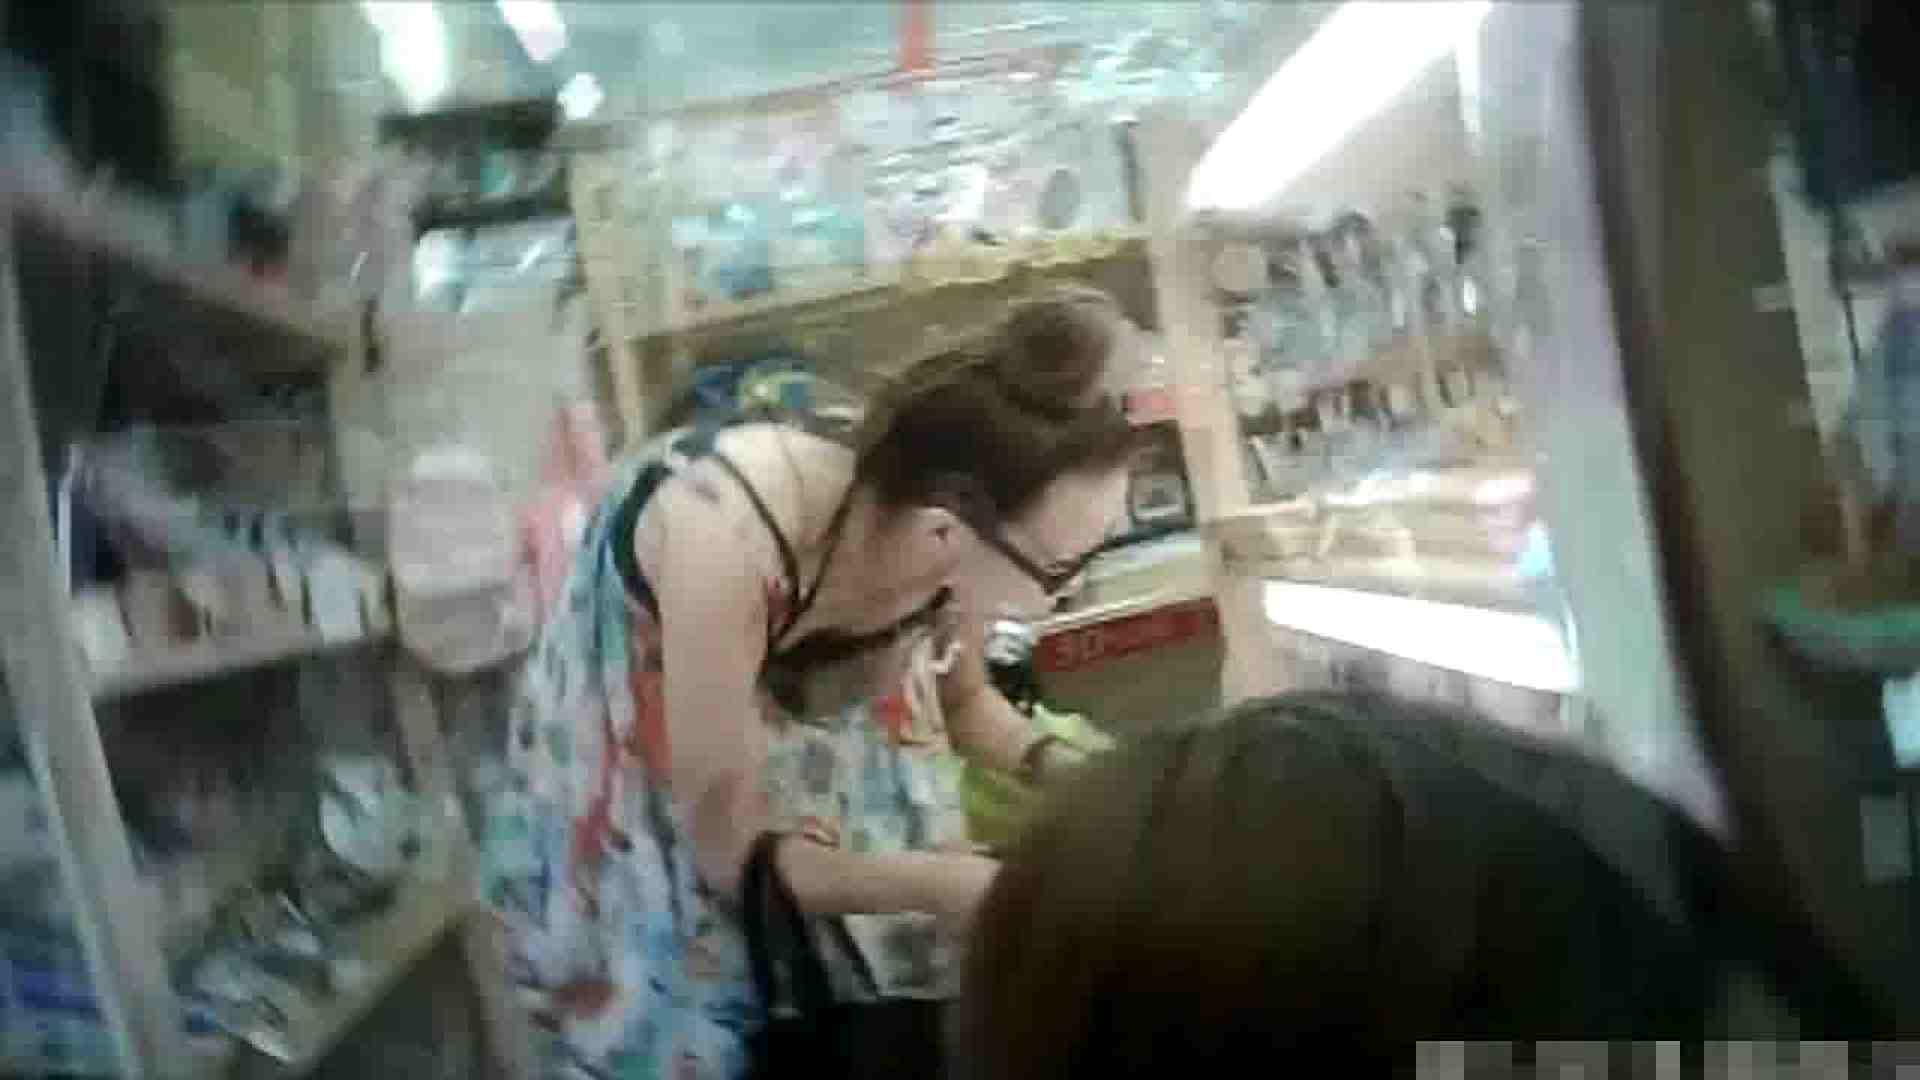 NO.6 雑貨屋で買い物中のガーリーな女の子 美乳 | ギャルズ  23画像 21